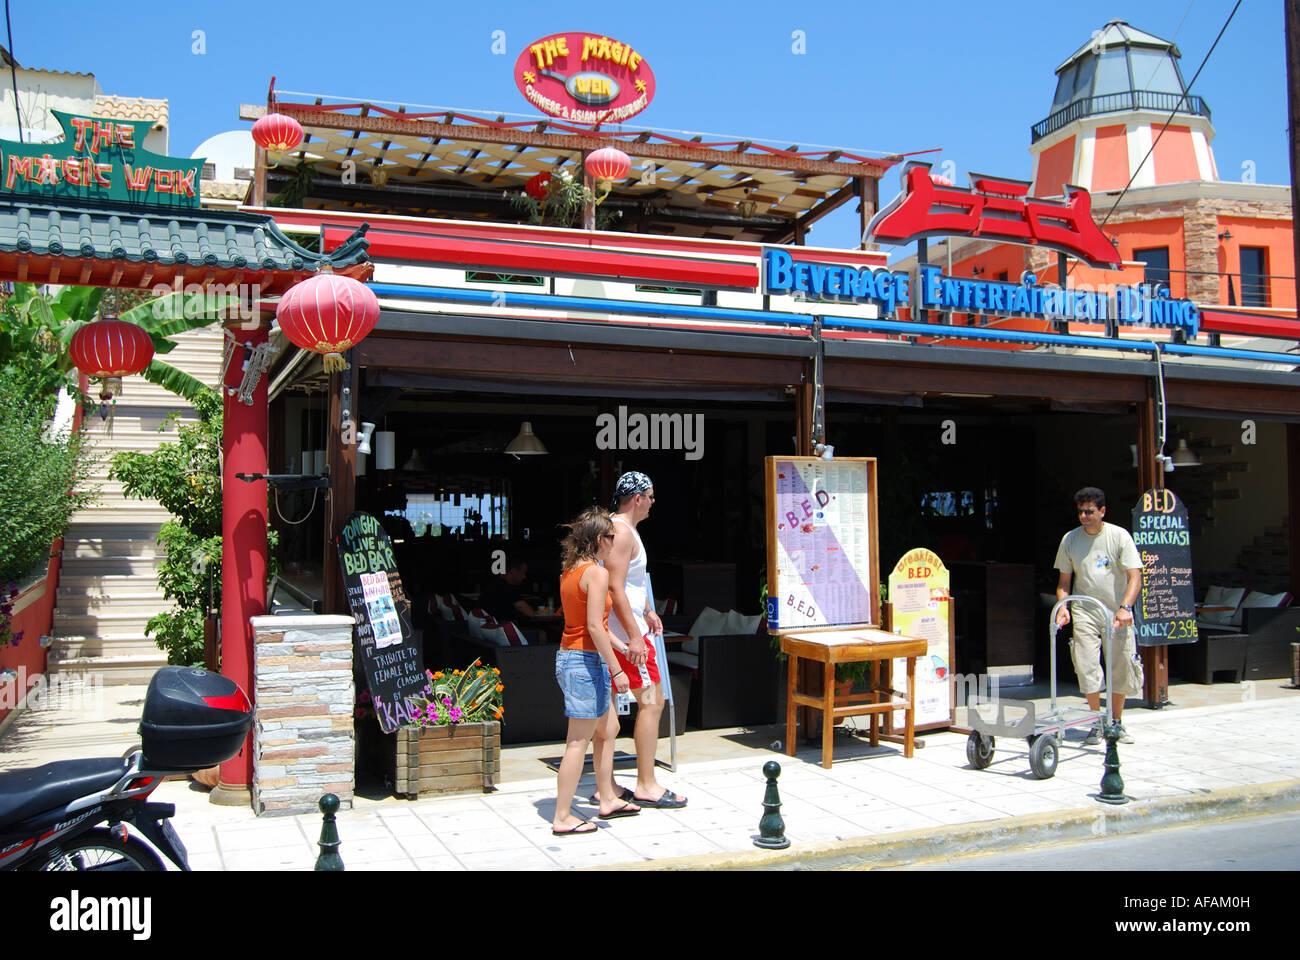 Tourist restaurant and bar, street promenade, Sidari, Corfu, Ionian Islands, Greece - Stock Image